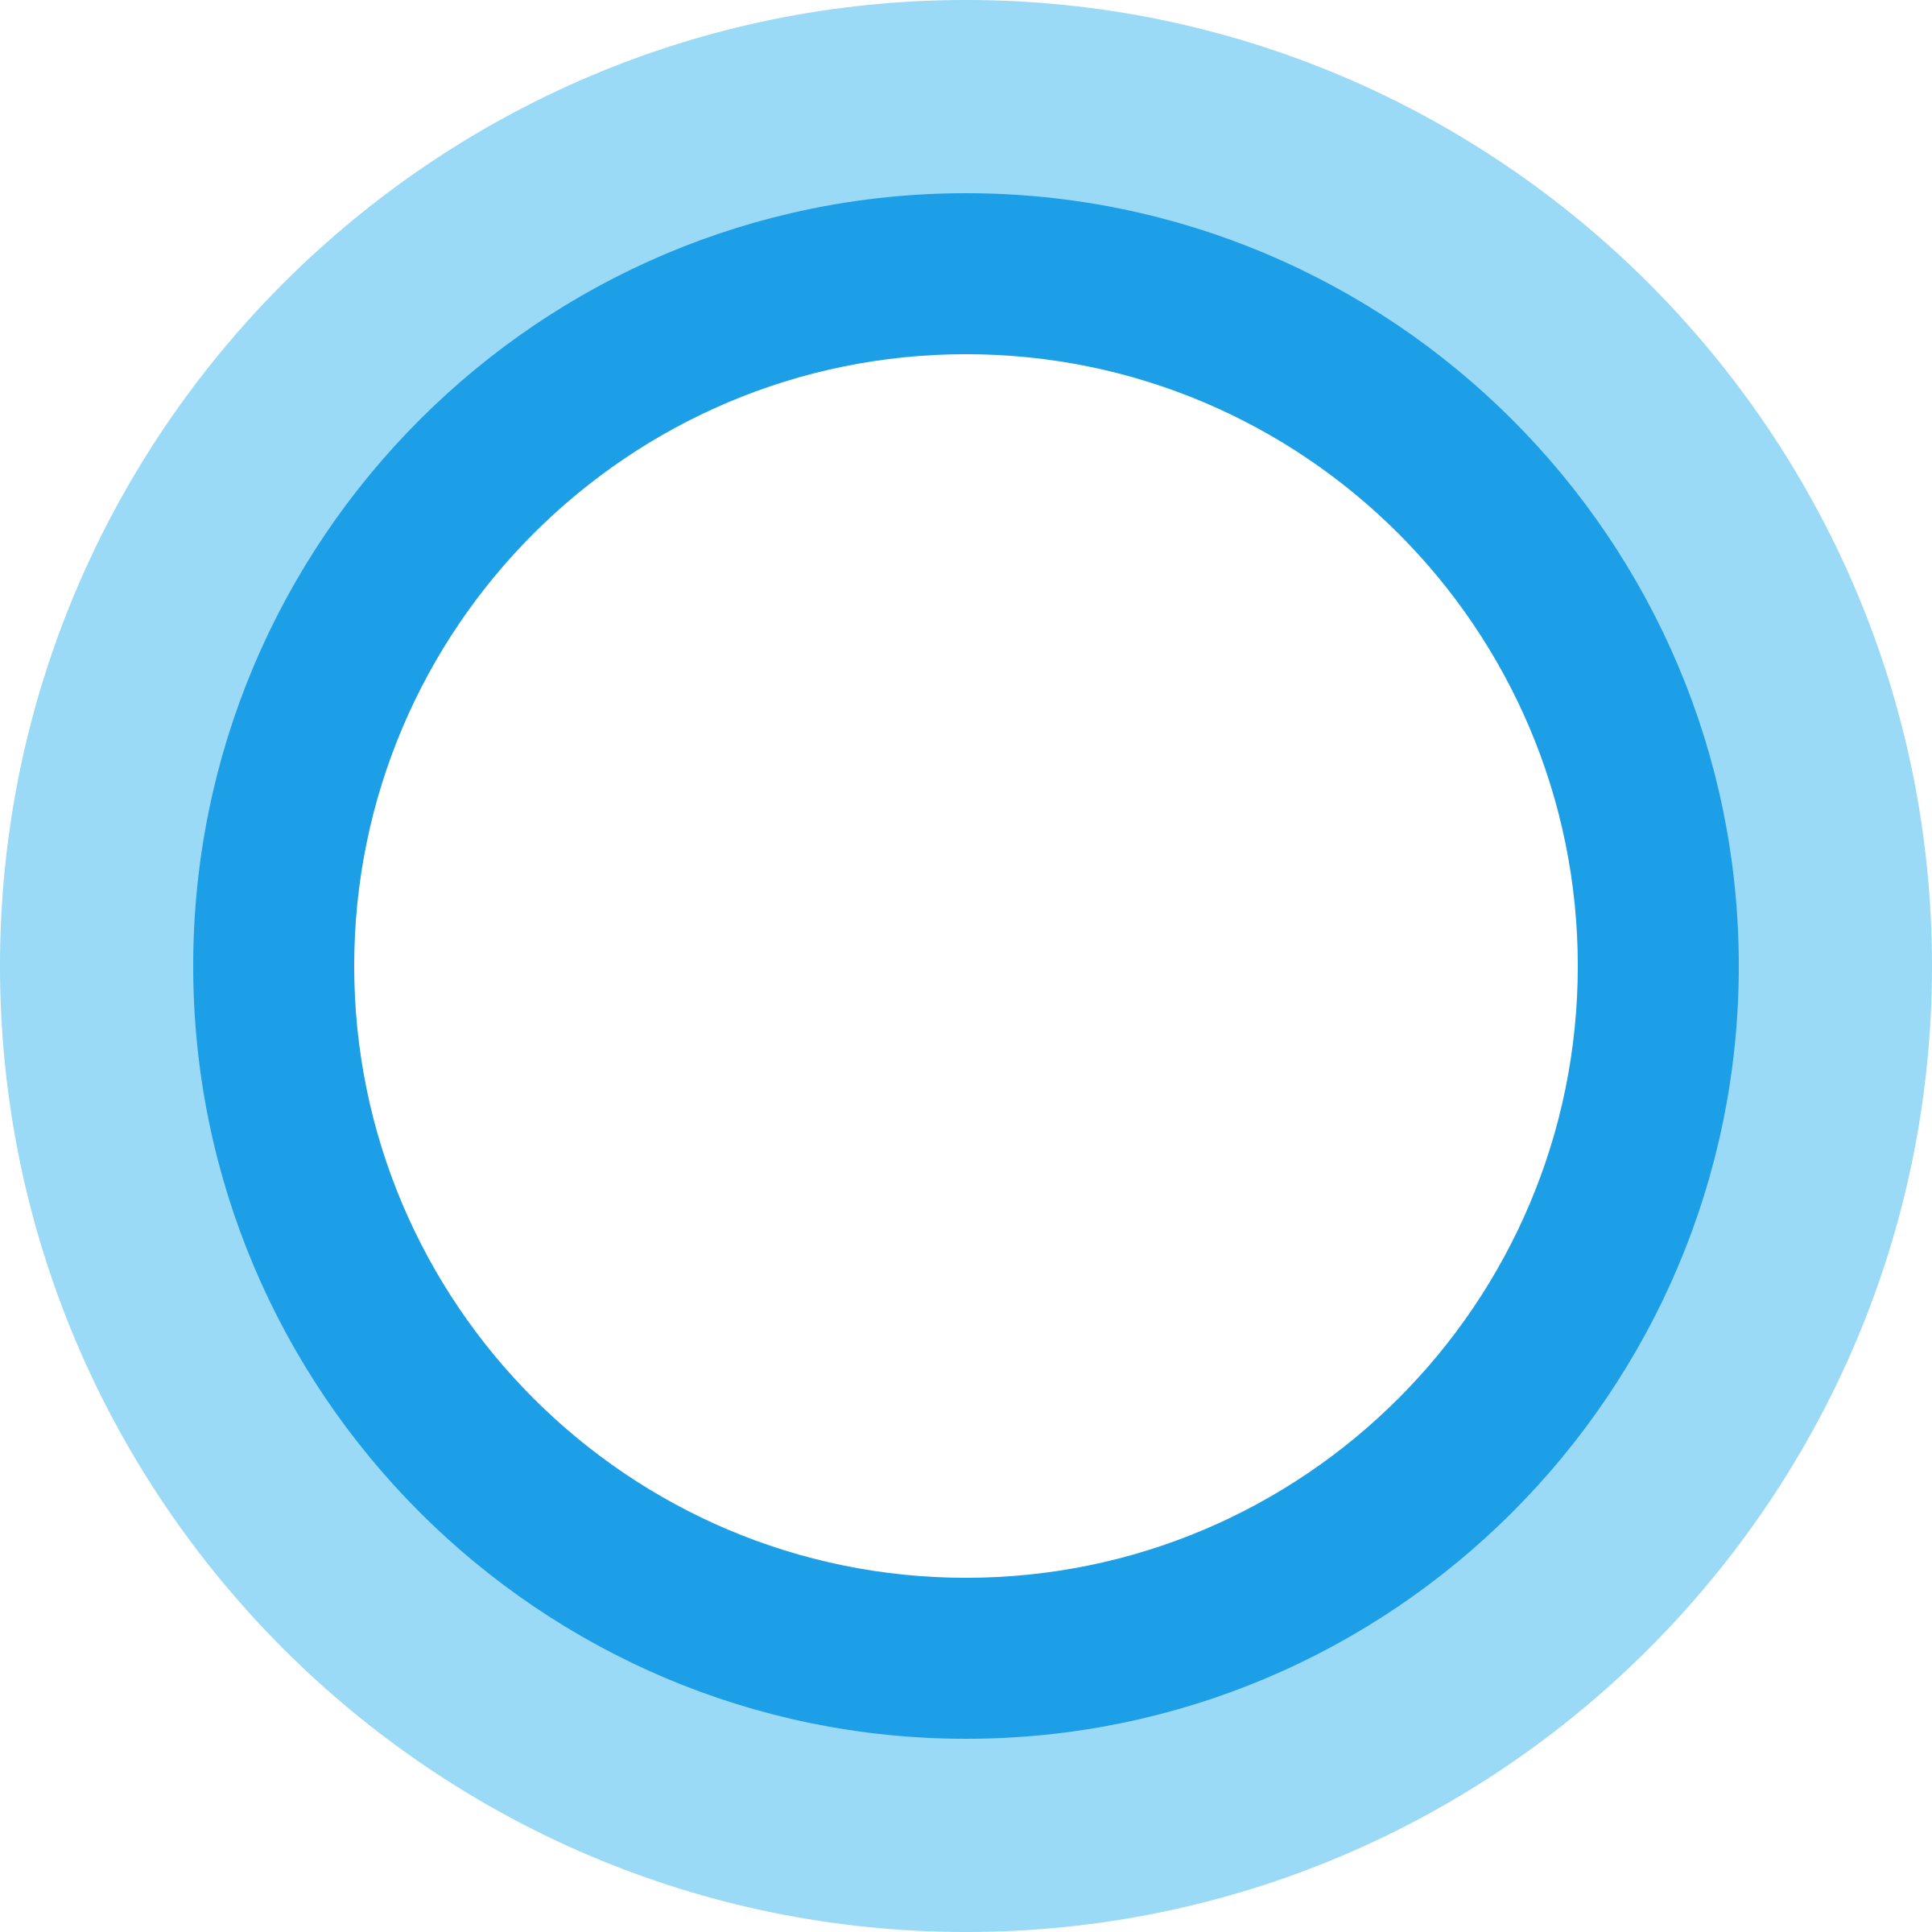 cortana microsoft logo png transparent svg vector freebie supply